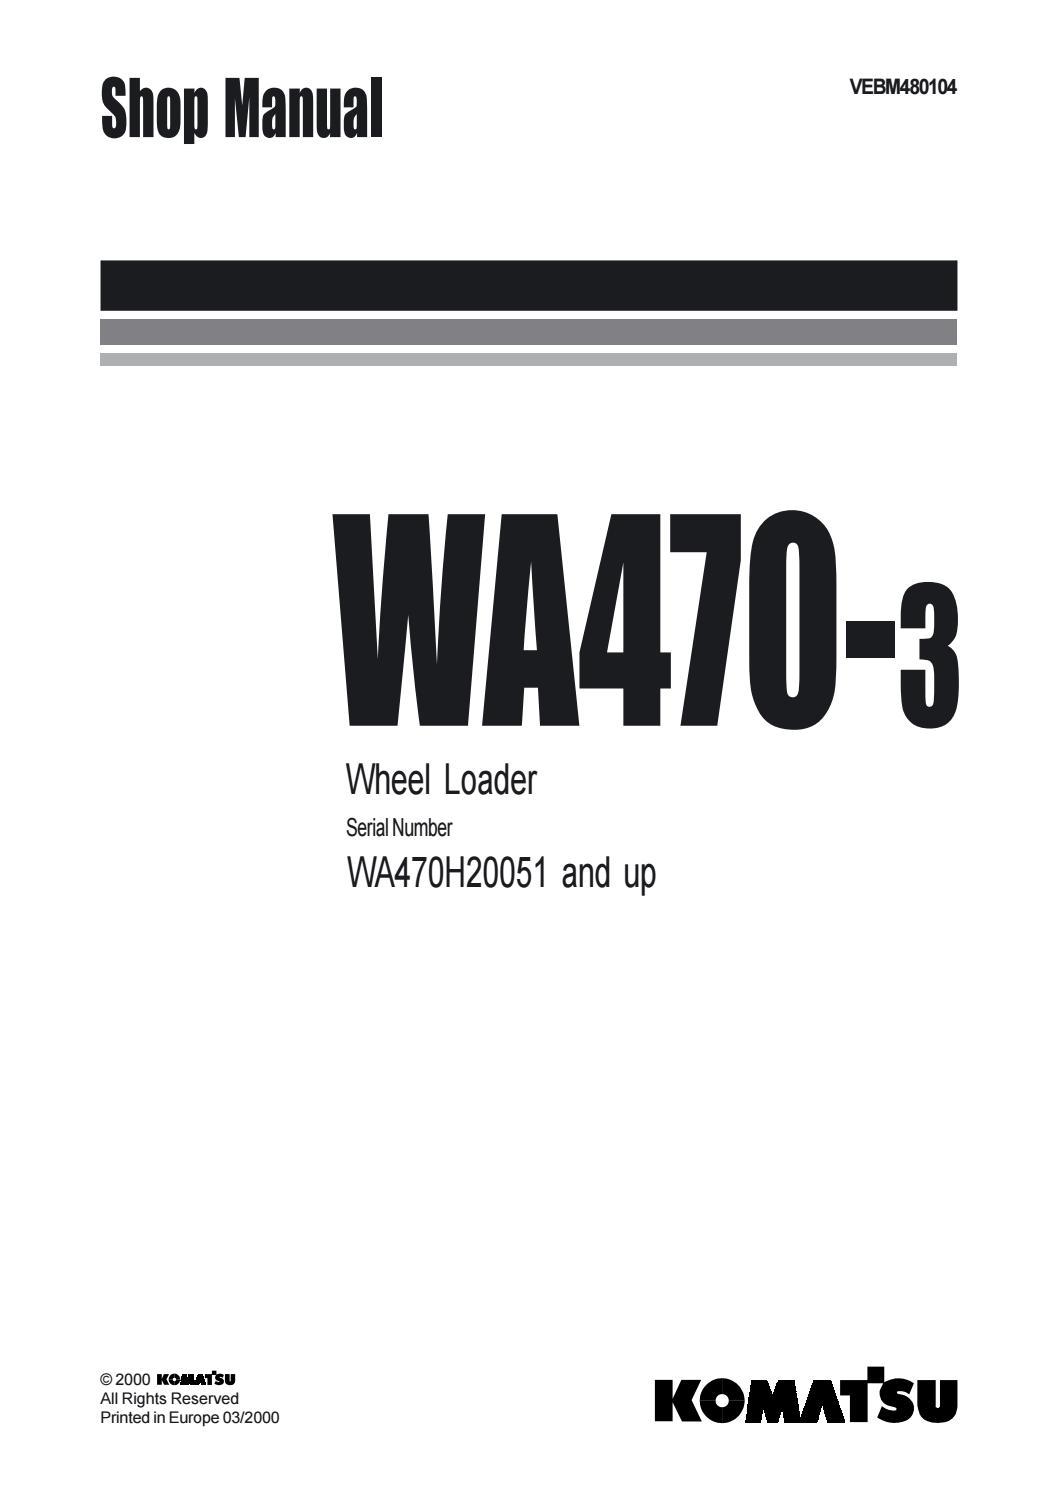 Komatsu WA470-3 Wheel Loader Service Repair Manual SN WA470H20051 and up by  16326108 - issuu